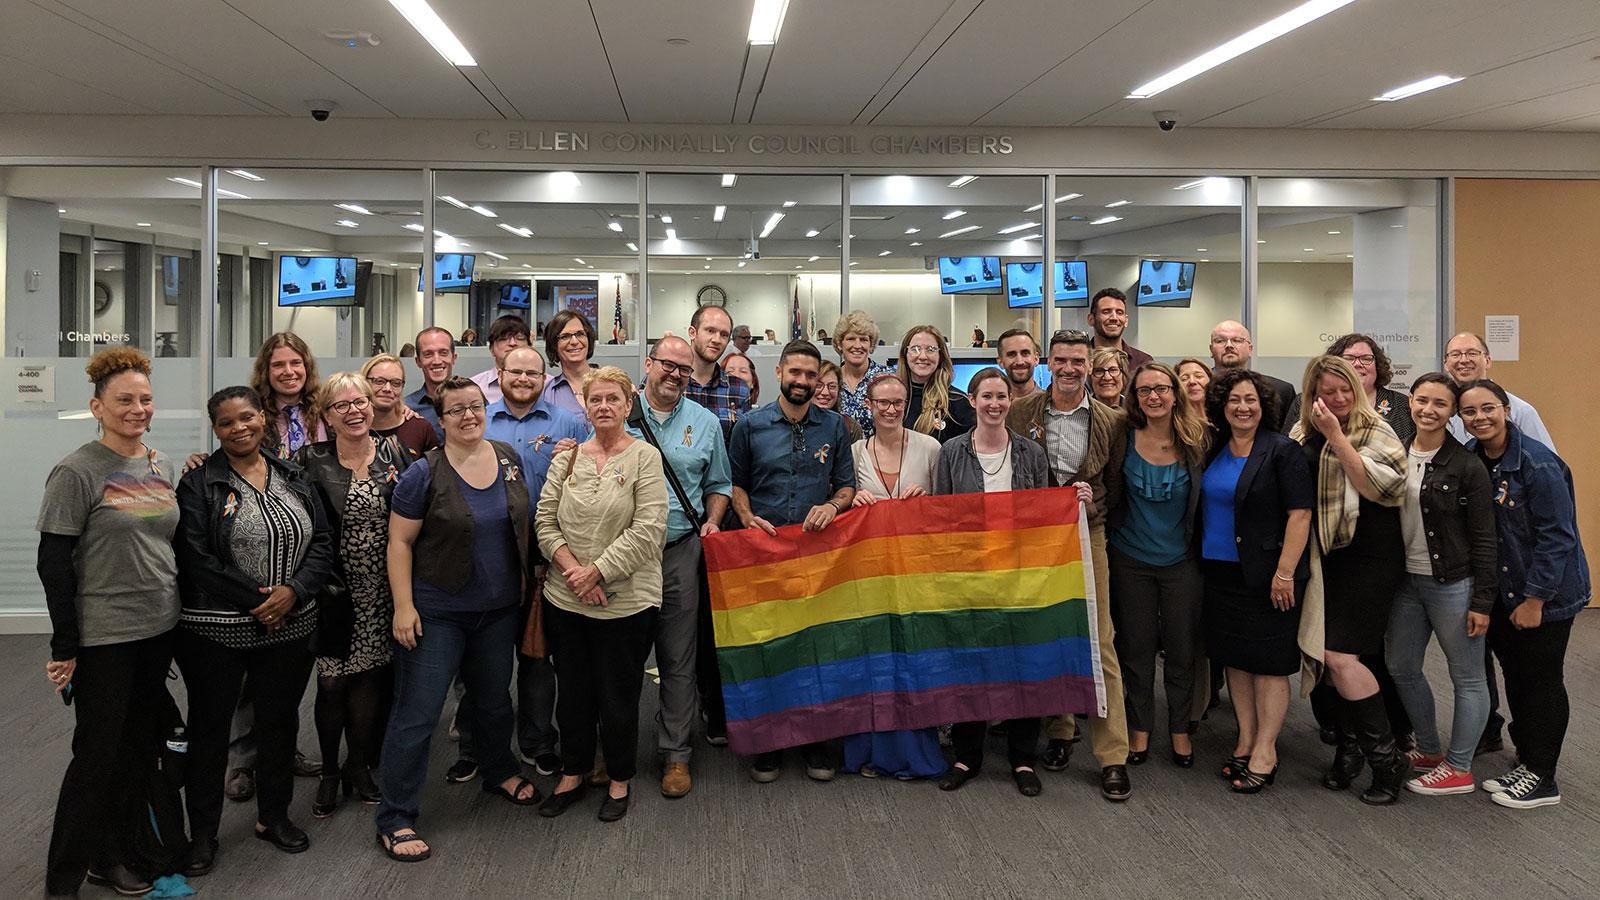 Victory! Cuyahoga County Council Passes LGBTQ-Inclusive Non-Discrimination Ordinance